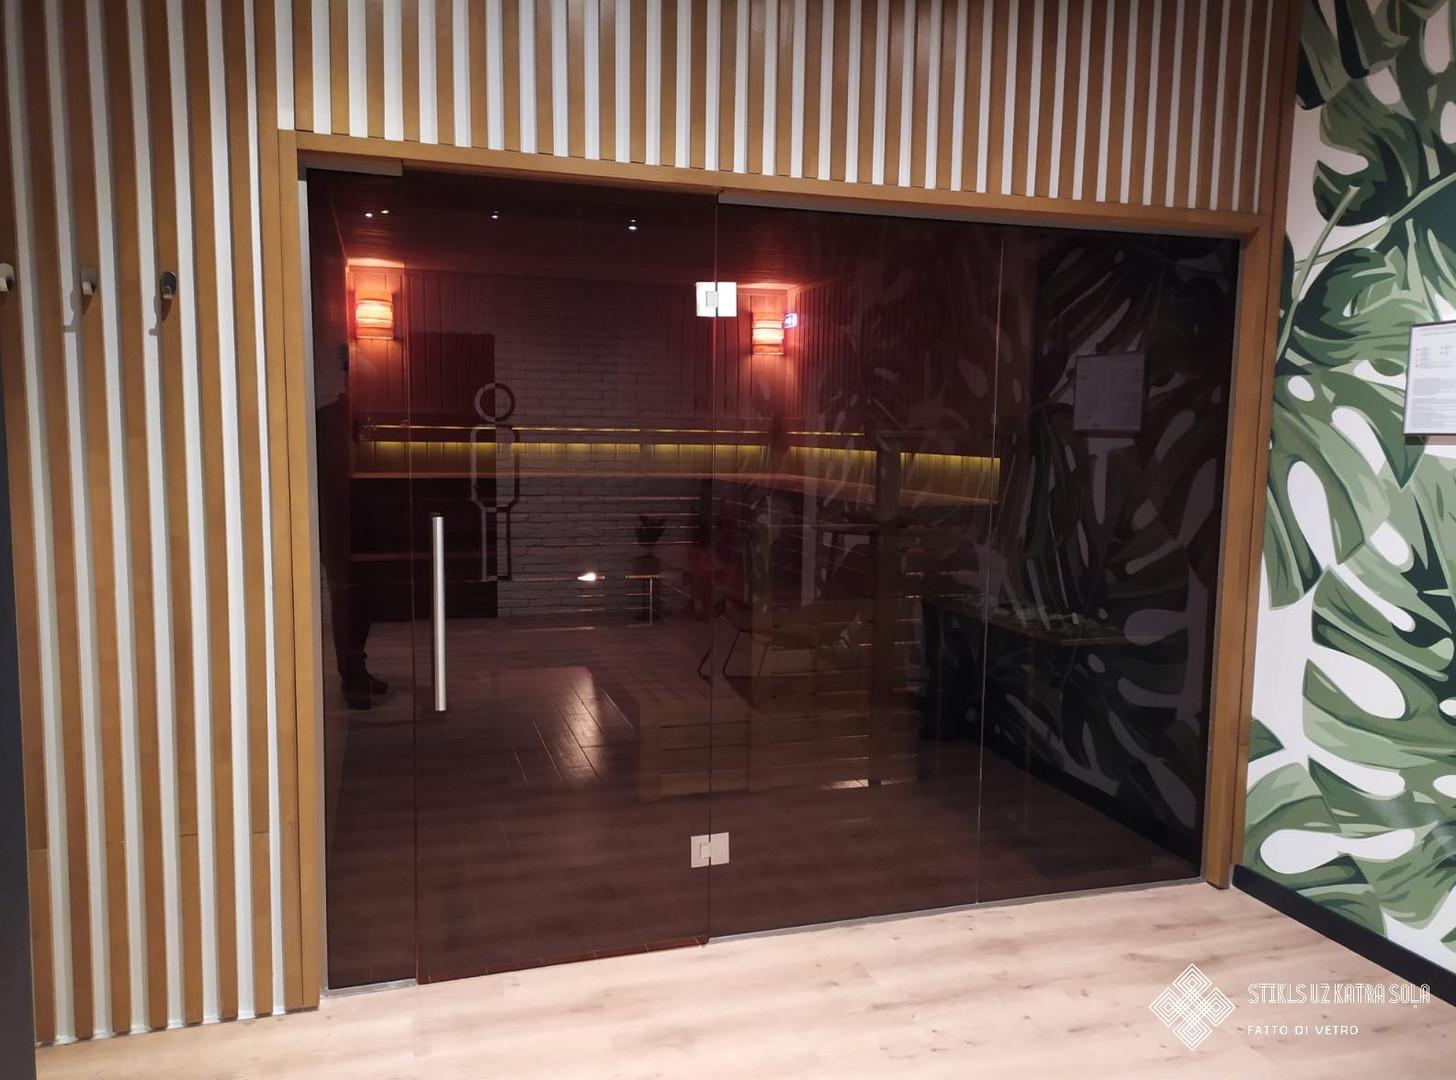 Veramas stikla durvis